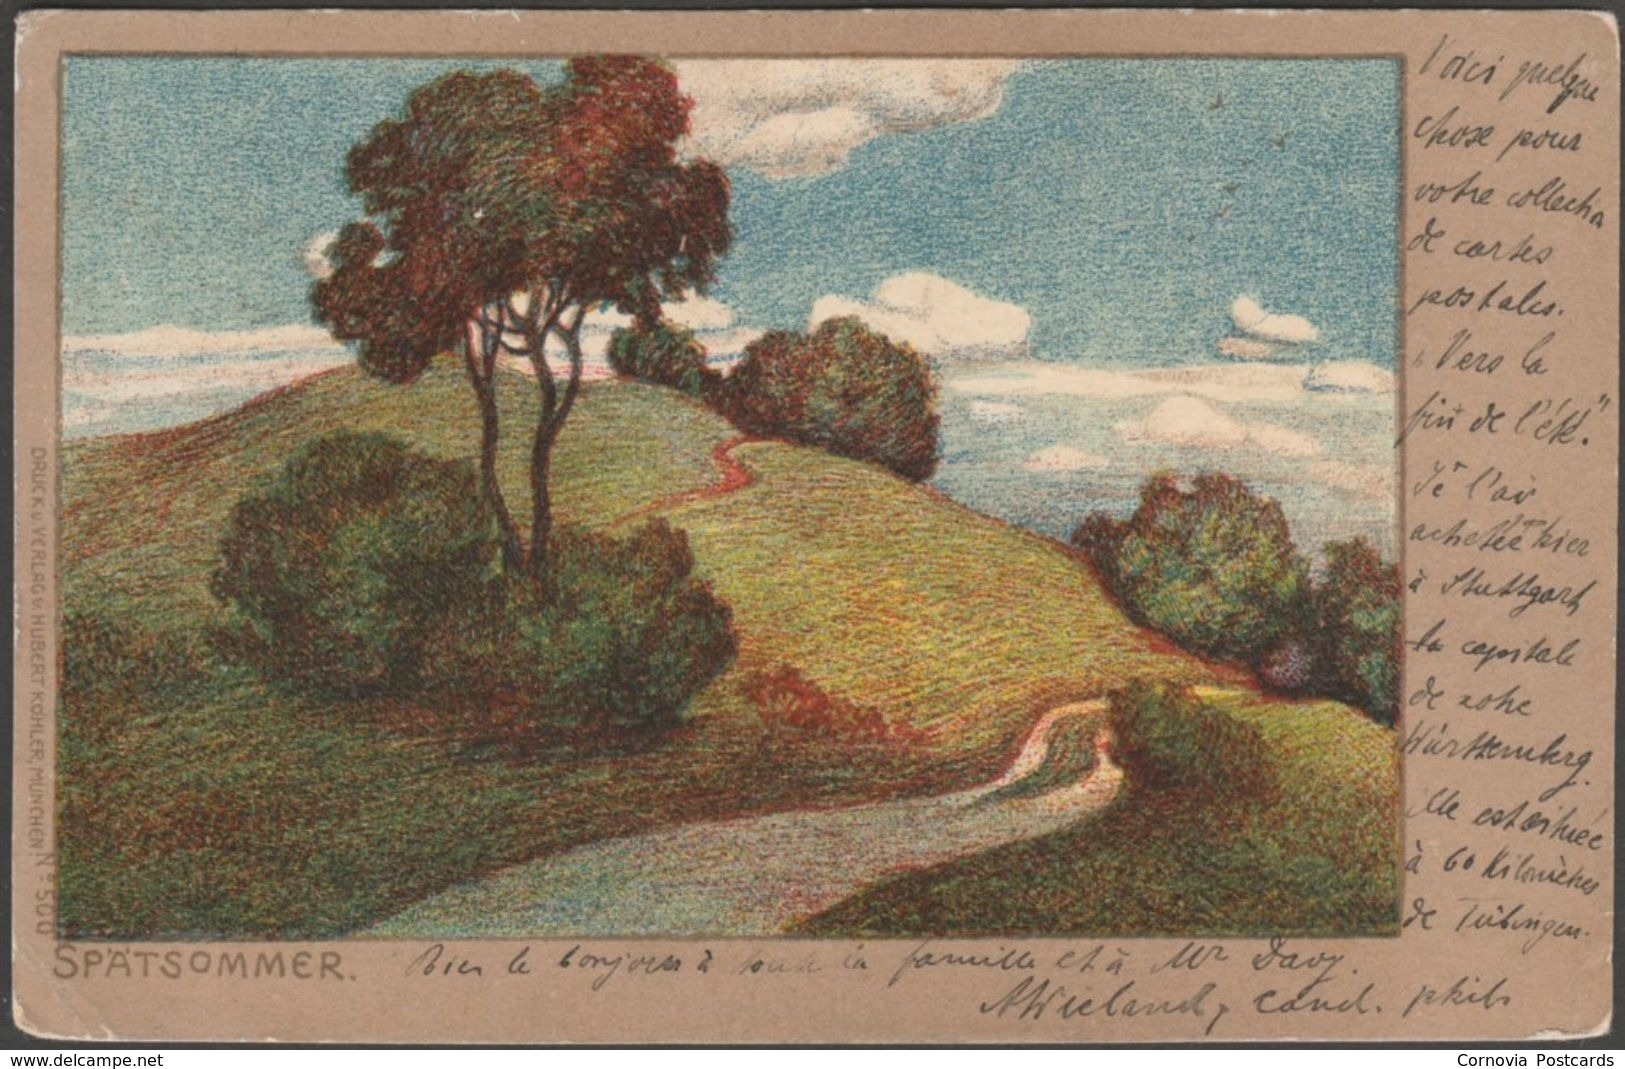 Art Nouveau - Spätsommer, 1905 - Hubert Köhler U/B AK - Künstlerkarten